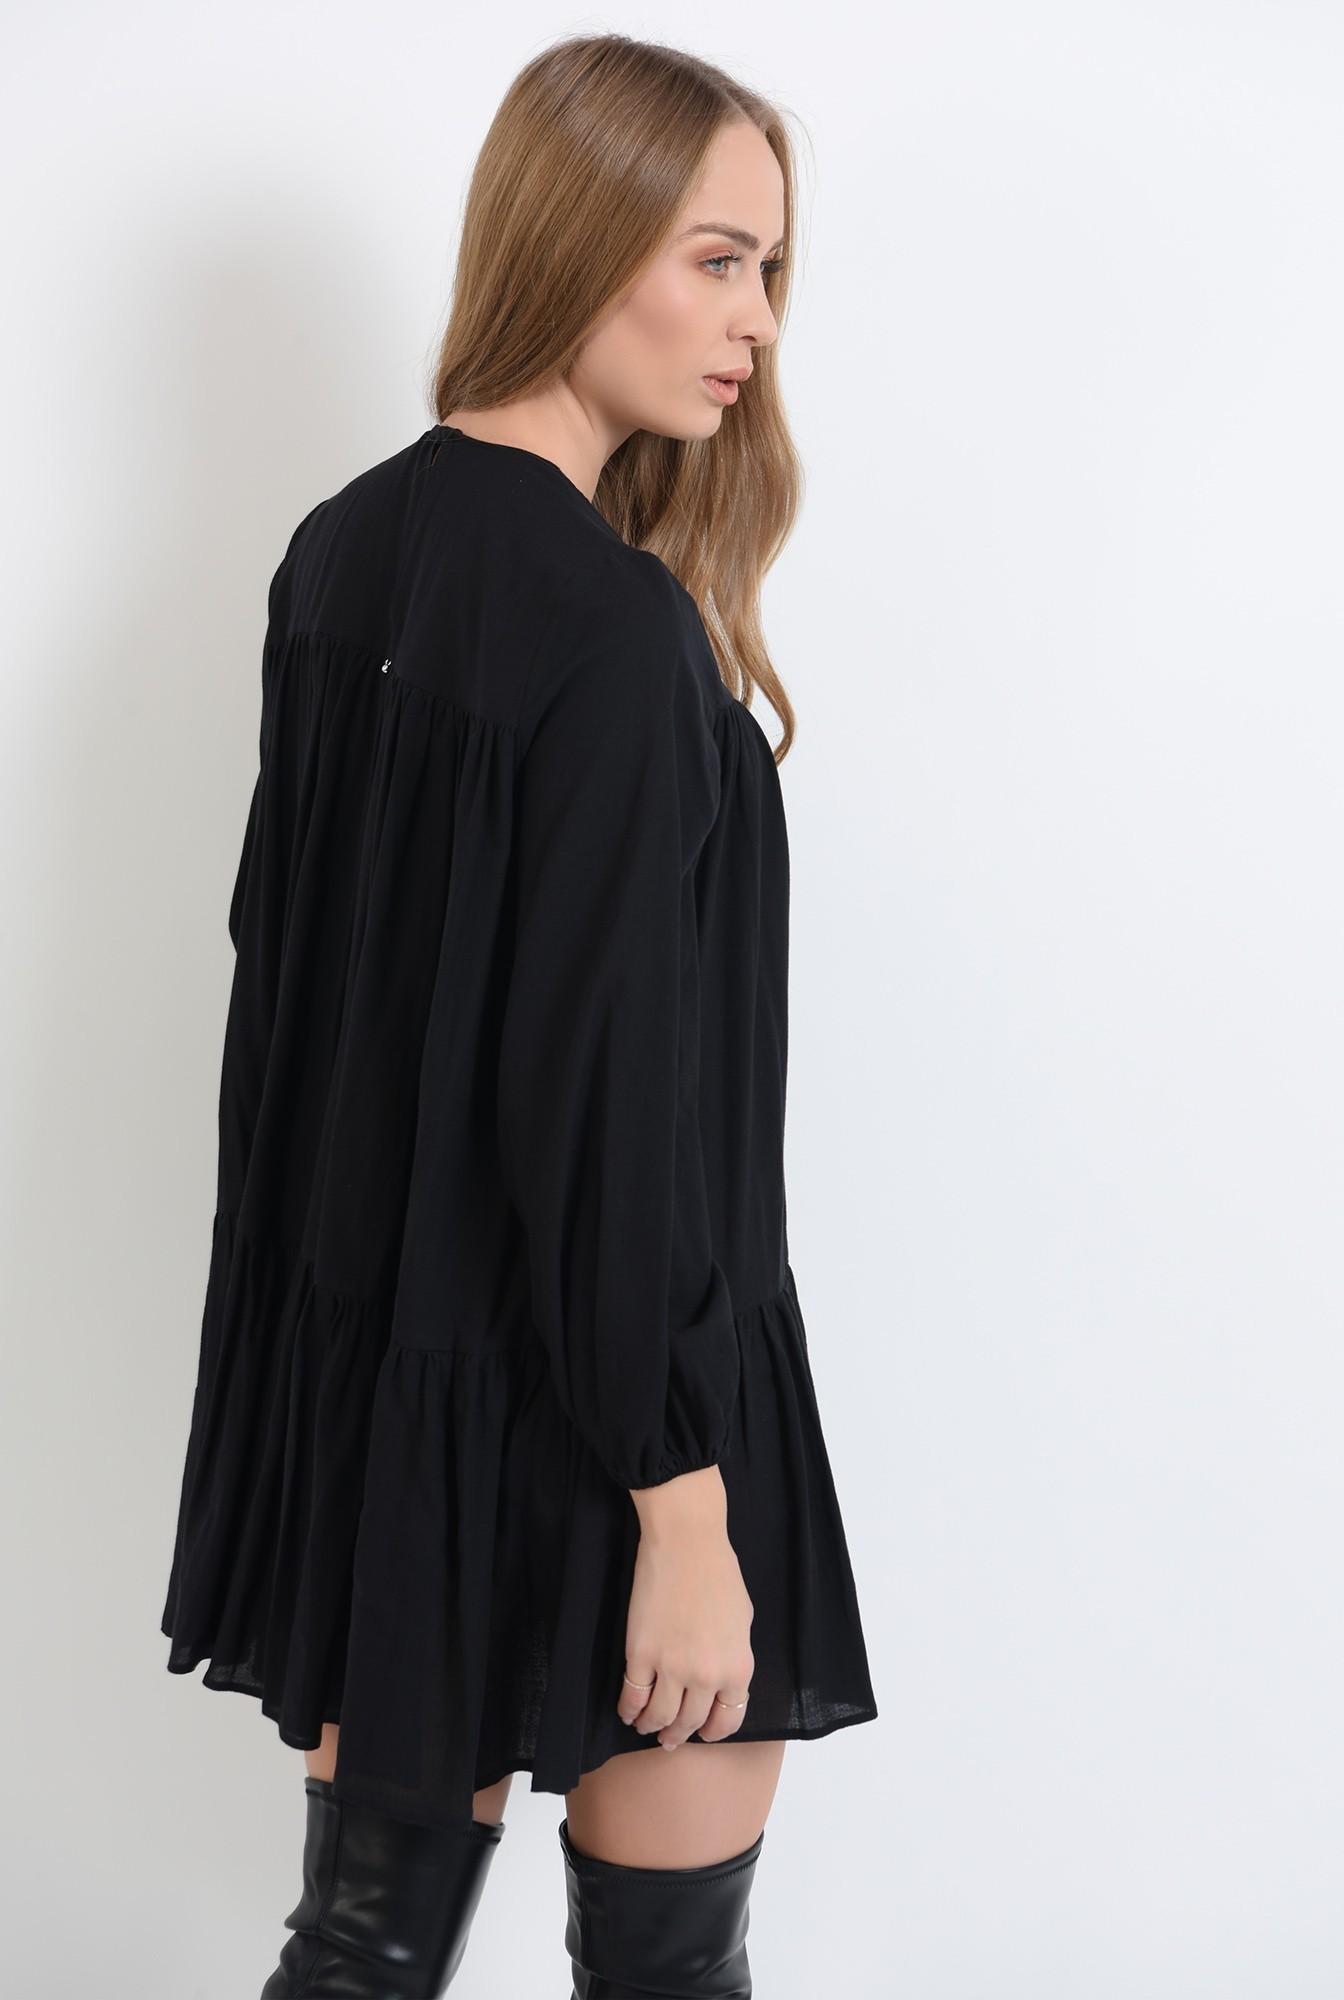 1 - 360 - rochie neagra scurta,cu maneca lunga Poema